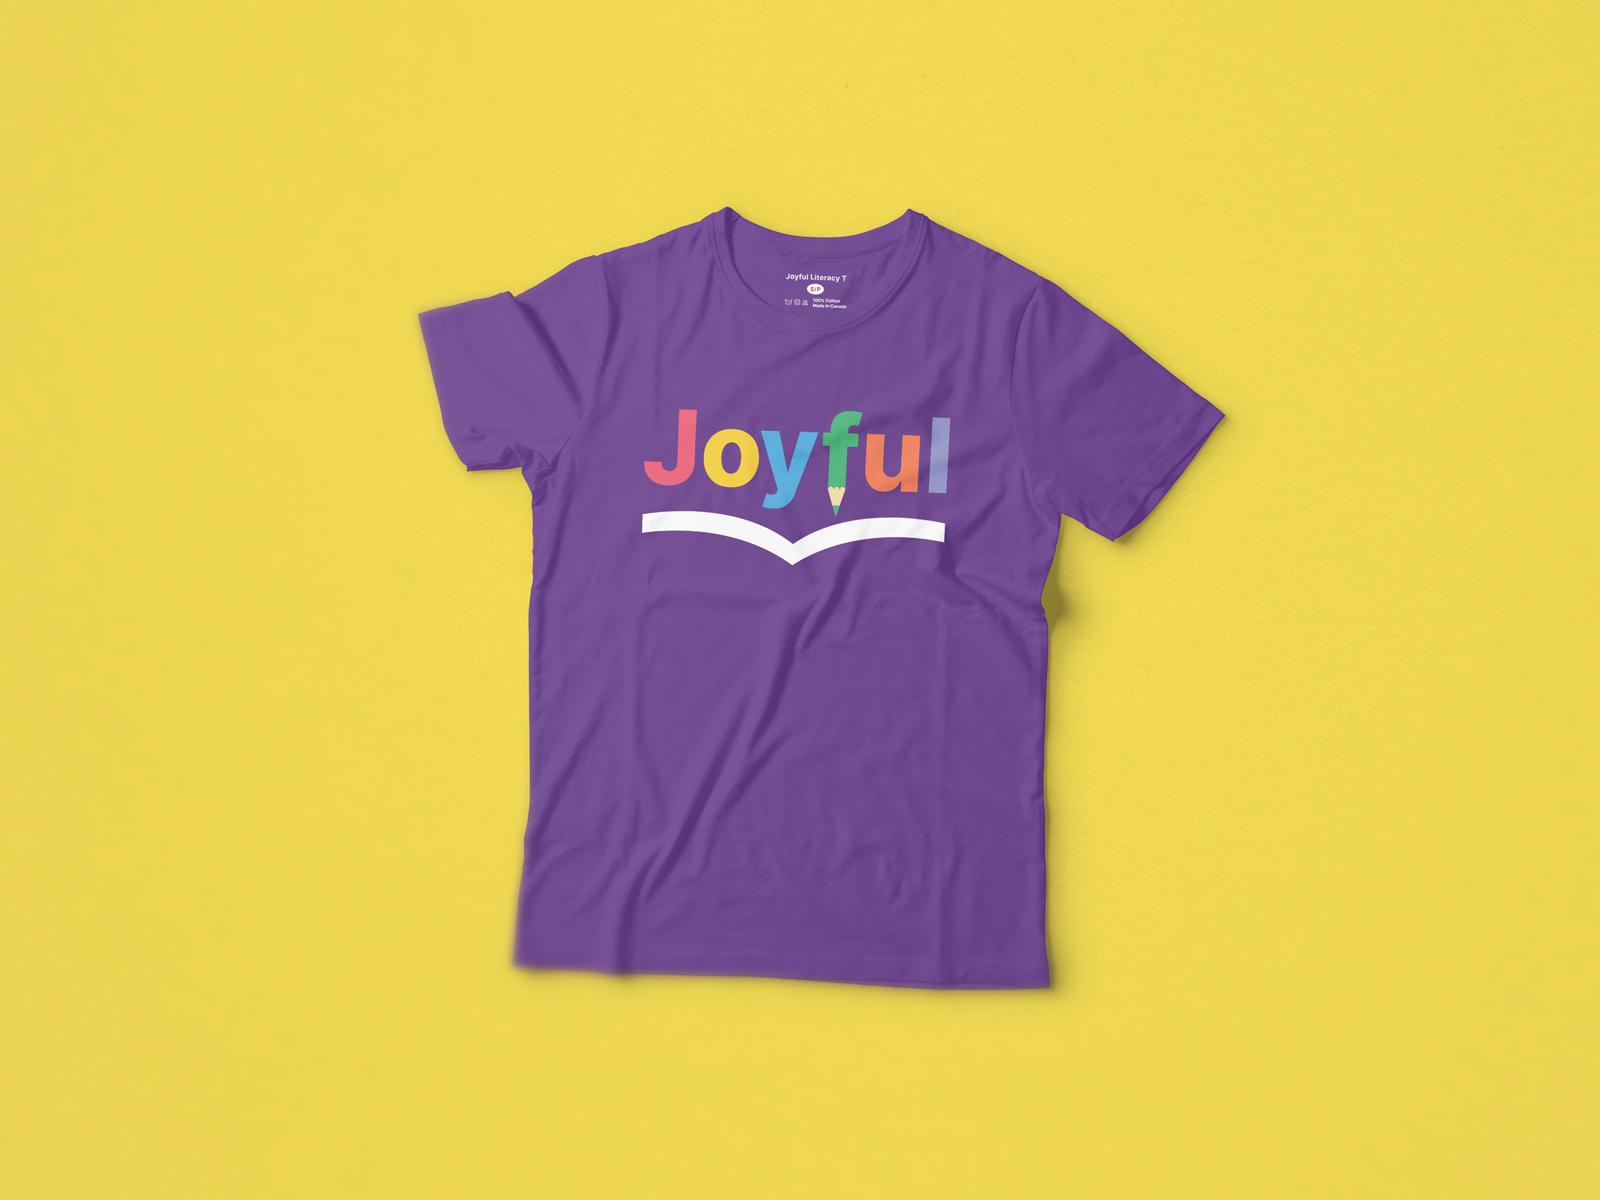 T Shirt Merchandise Design for Joyful Literacy